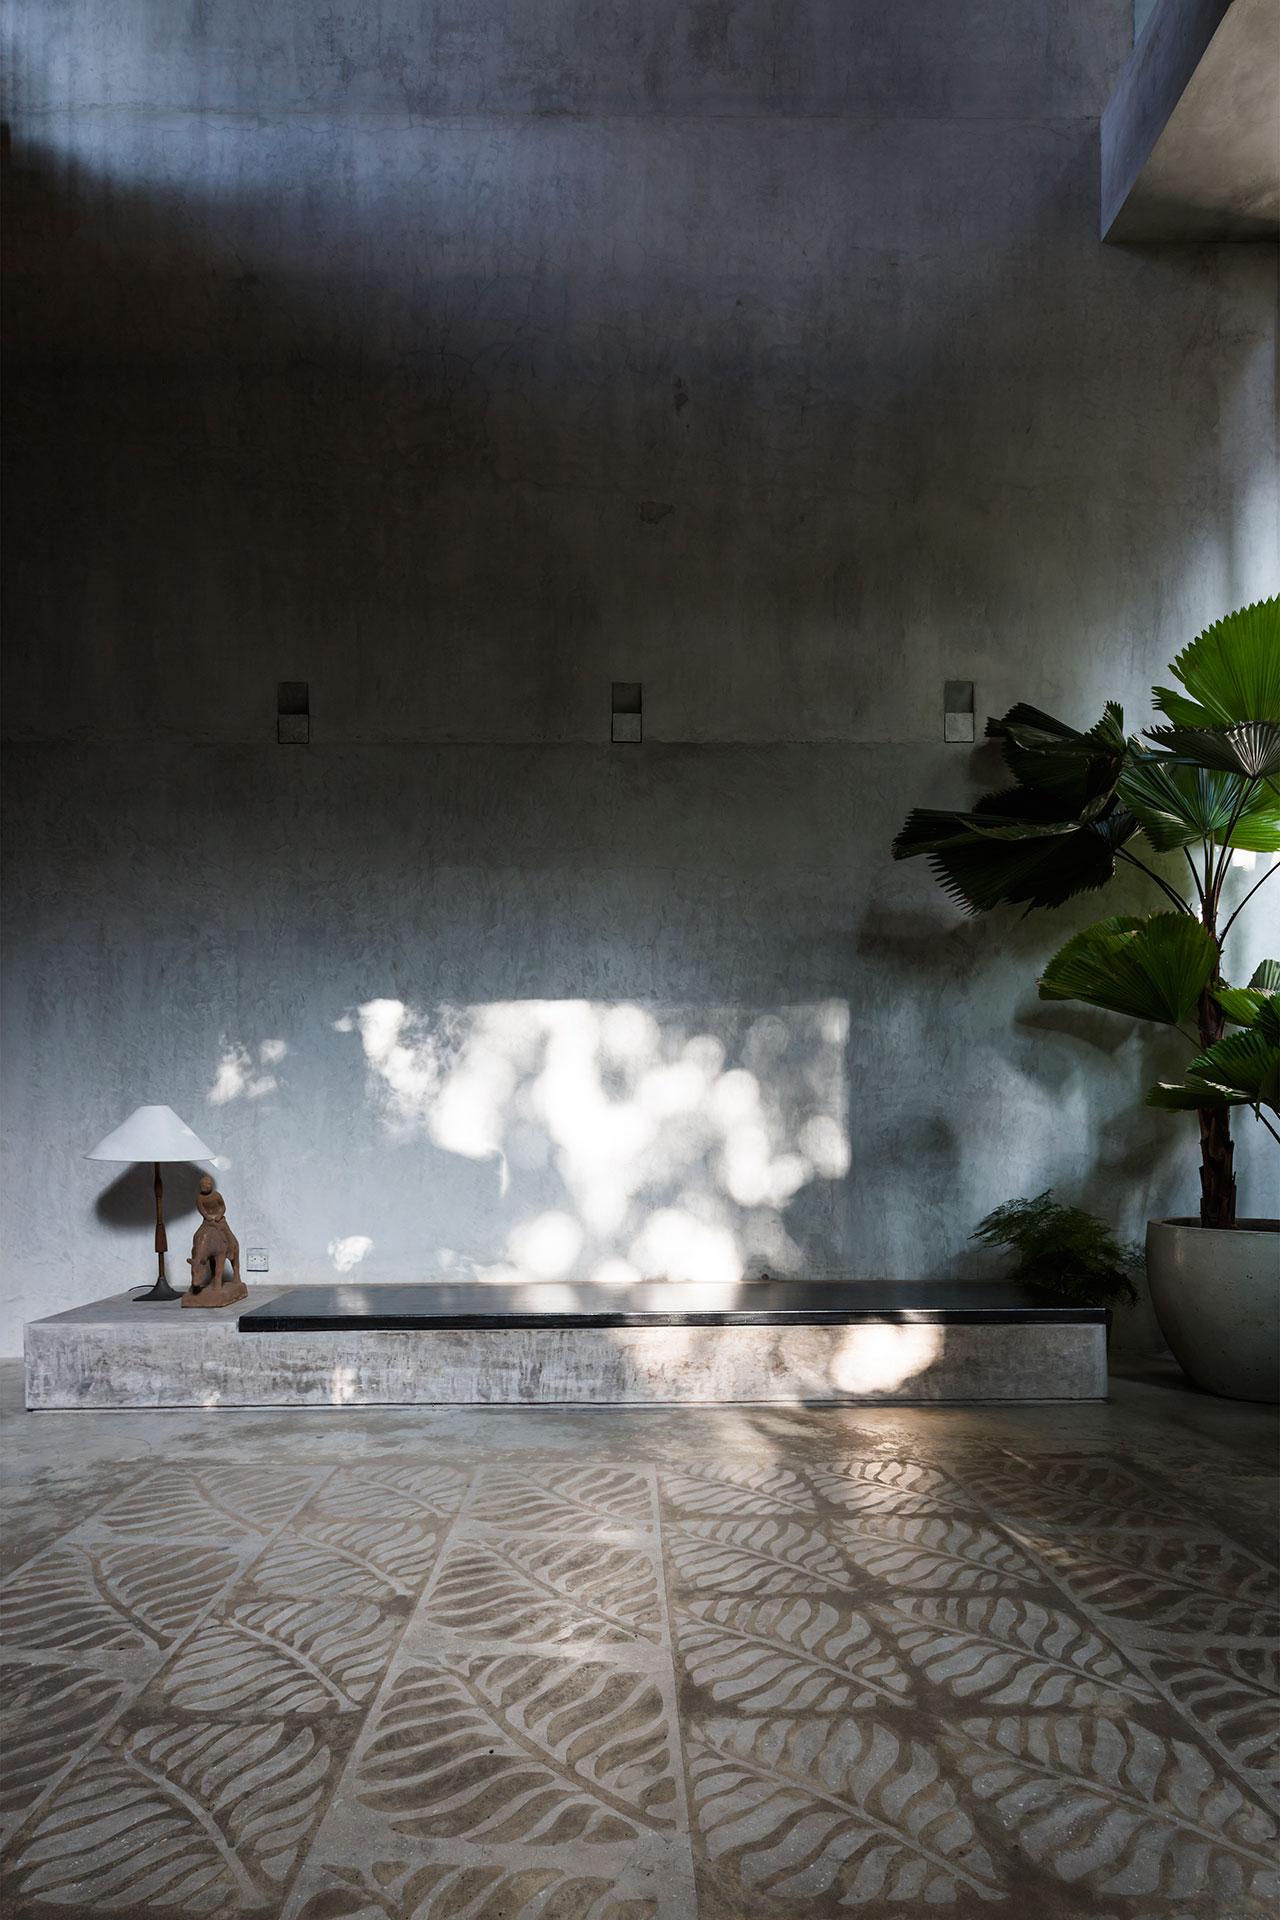 f4_thong_house_nishizawaarchitects_photo_hiroyuki_oki_yatzer-1.jpg